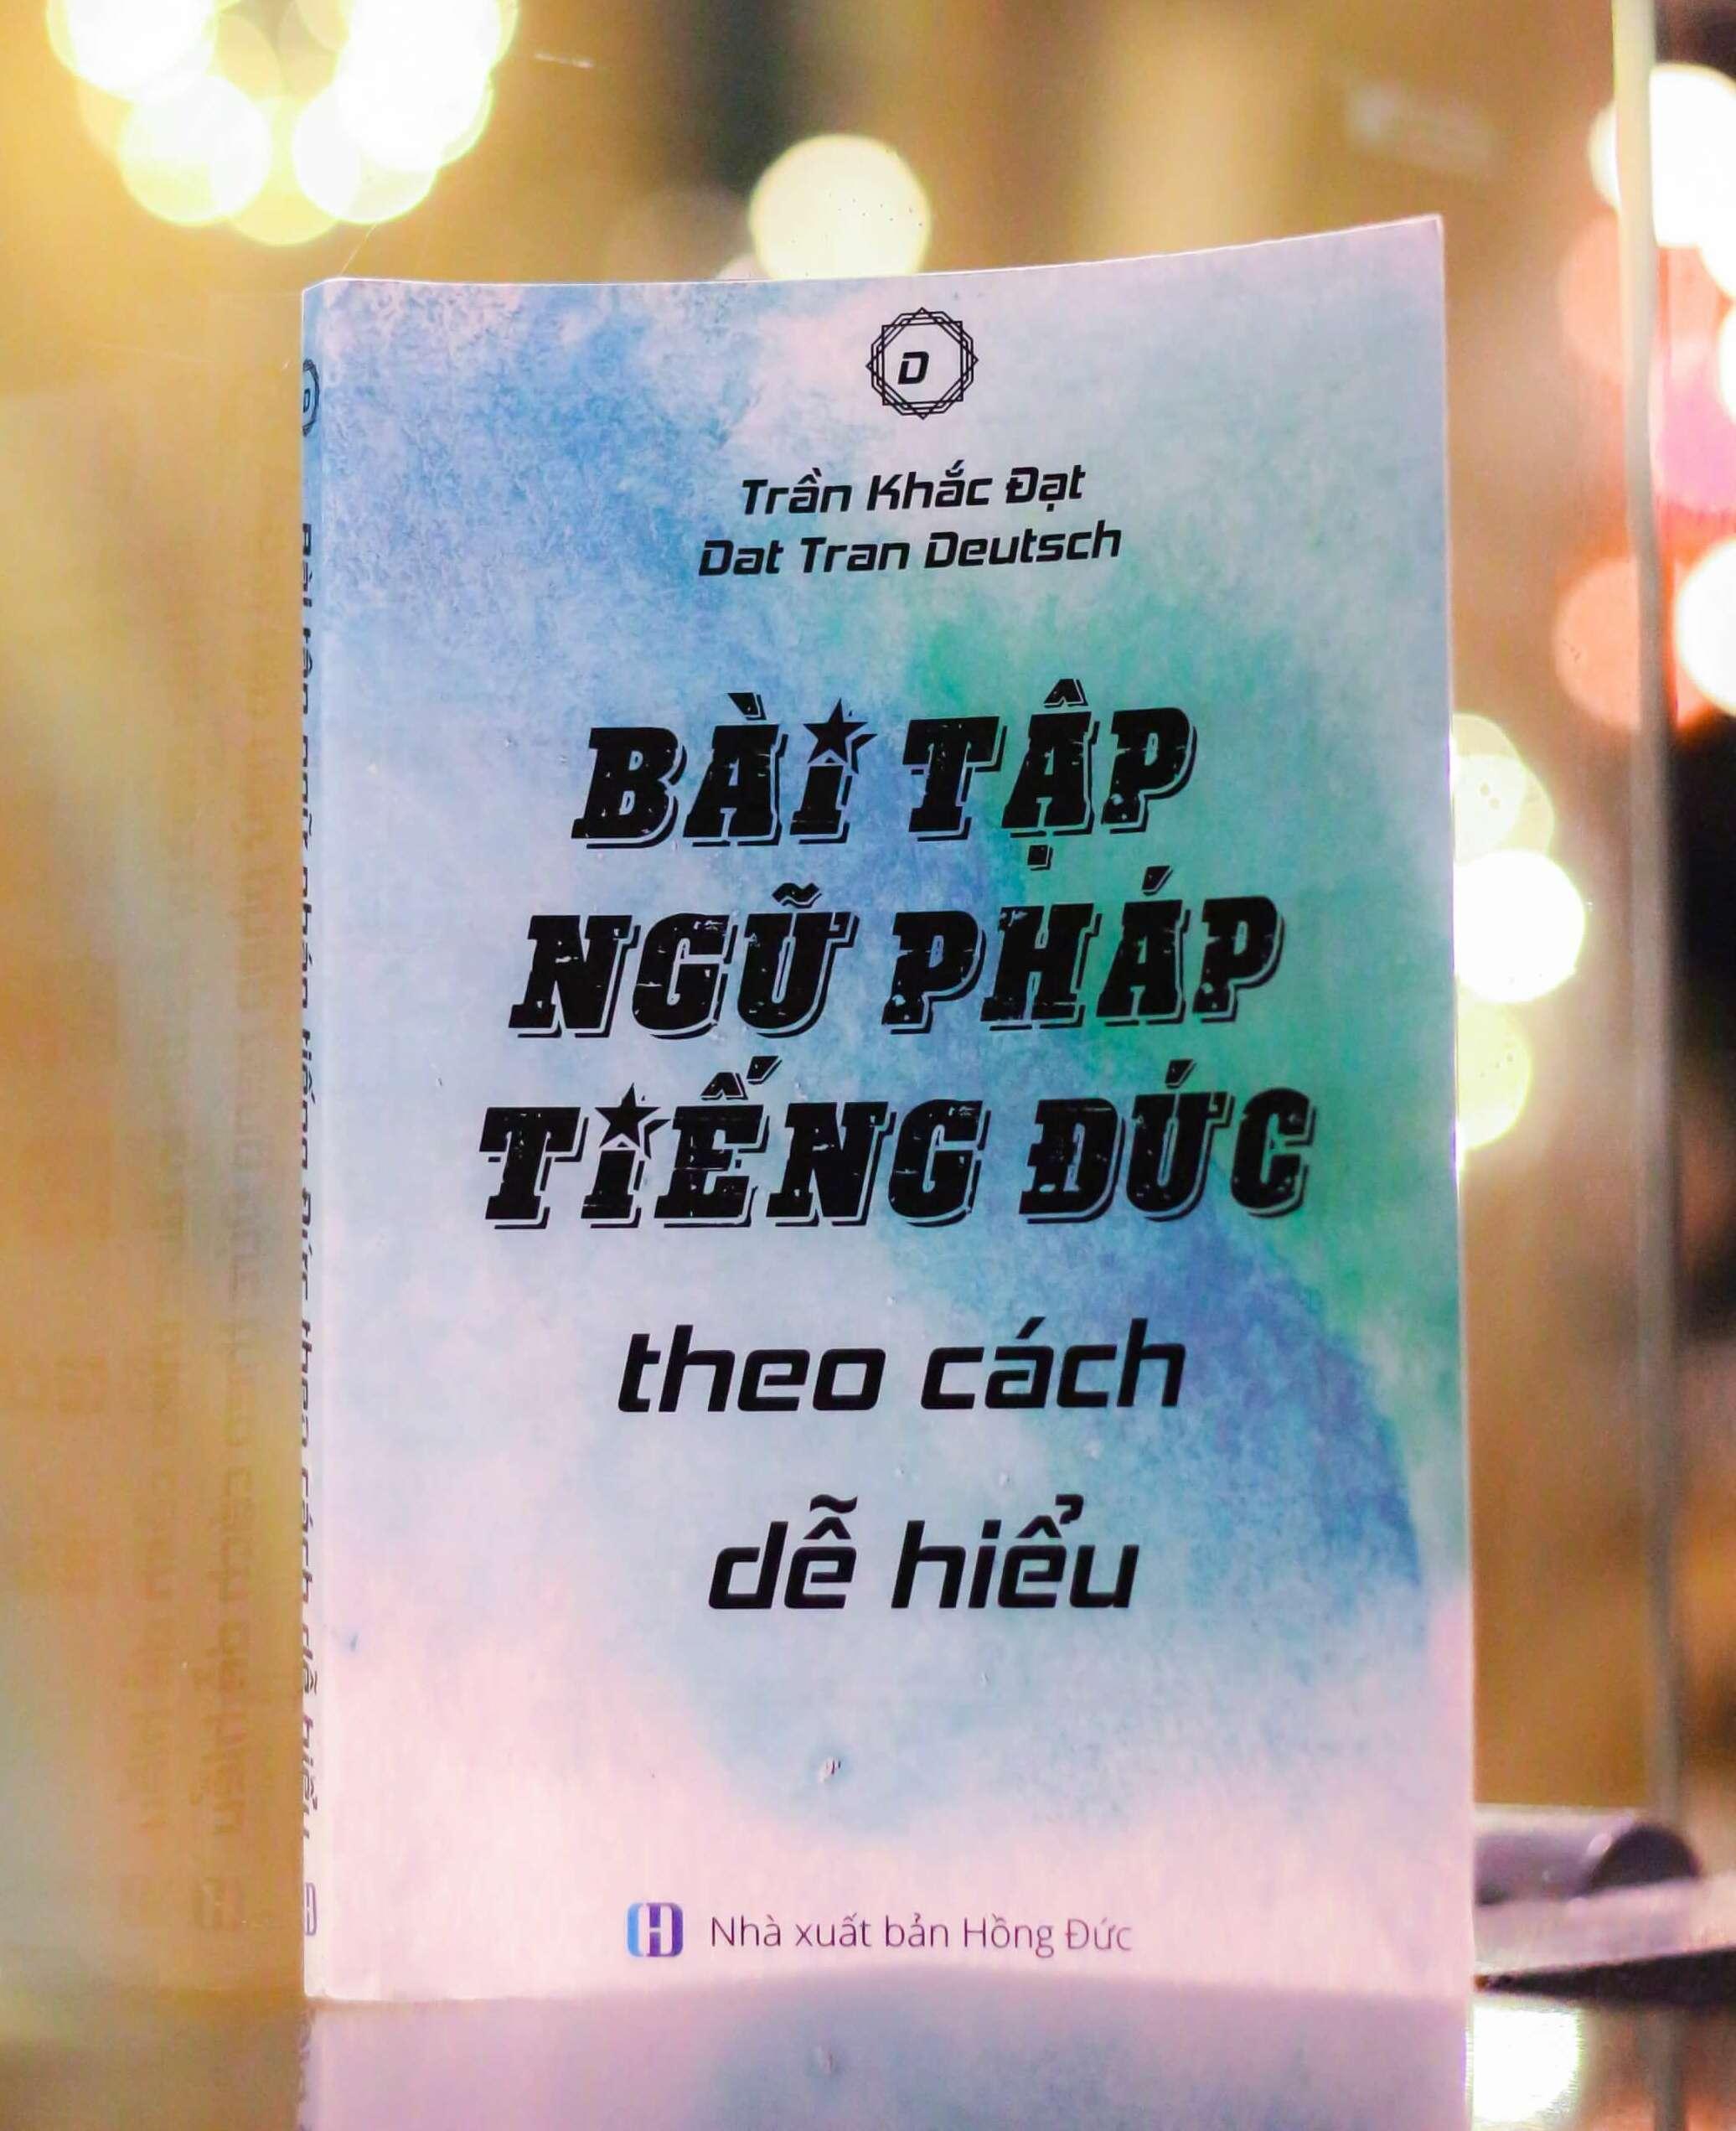 sach-bai-tap-ngu-phap-tieng-duc-03.jpg